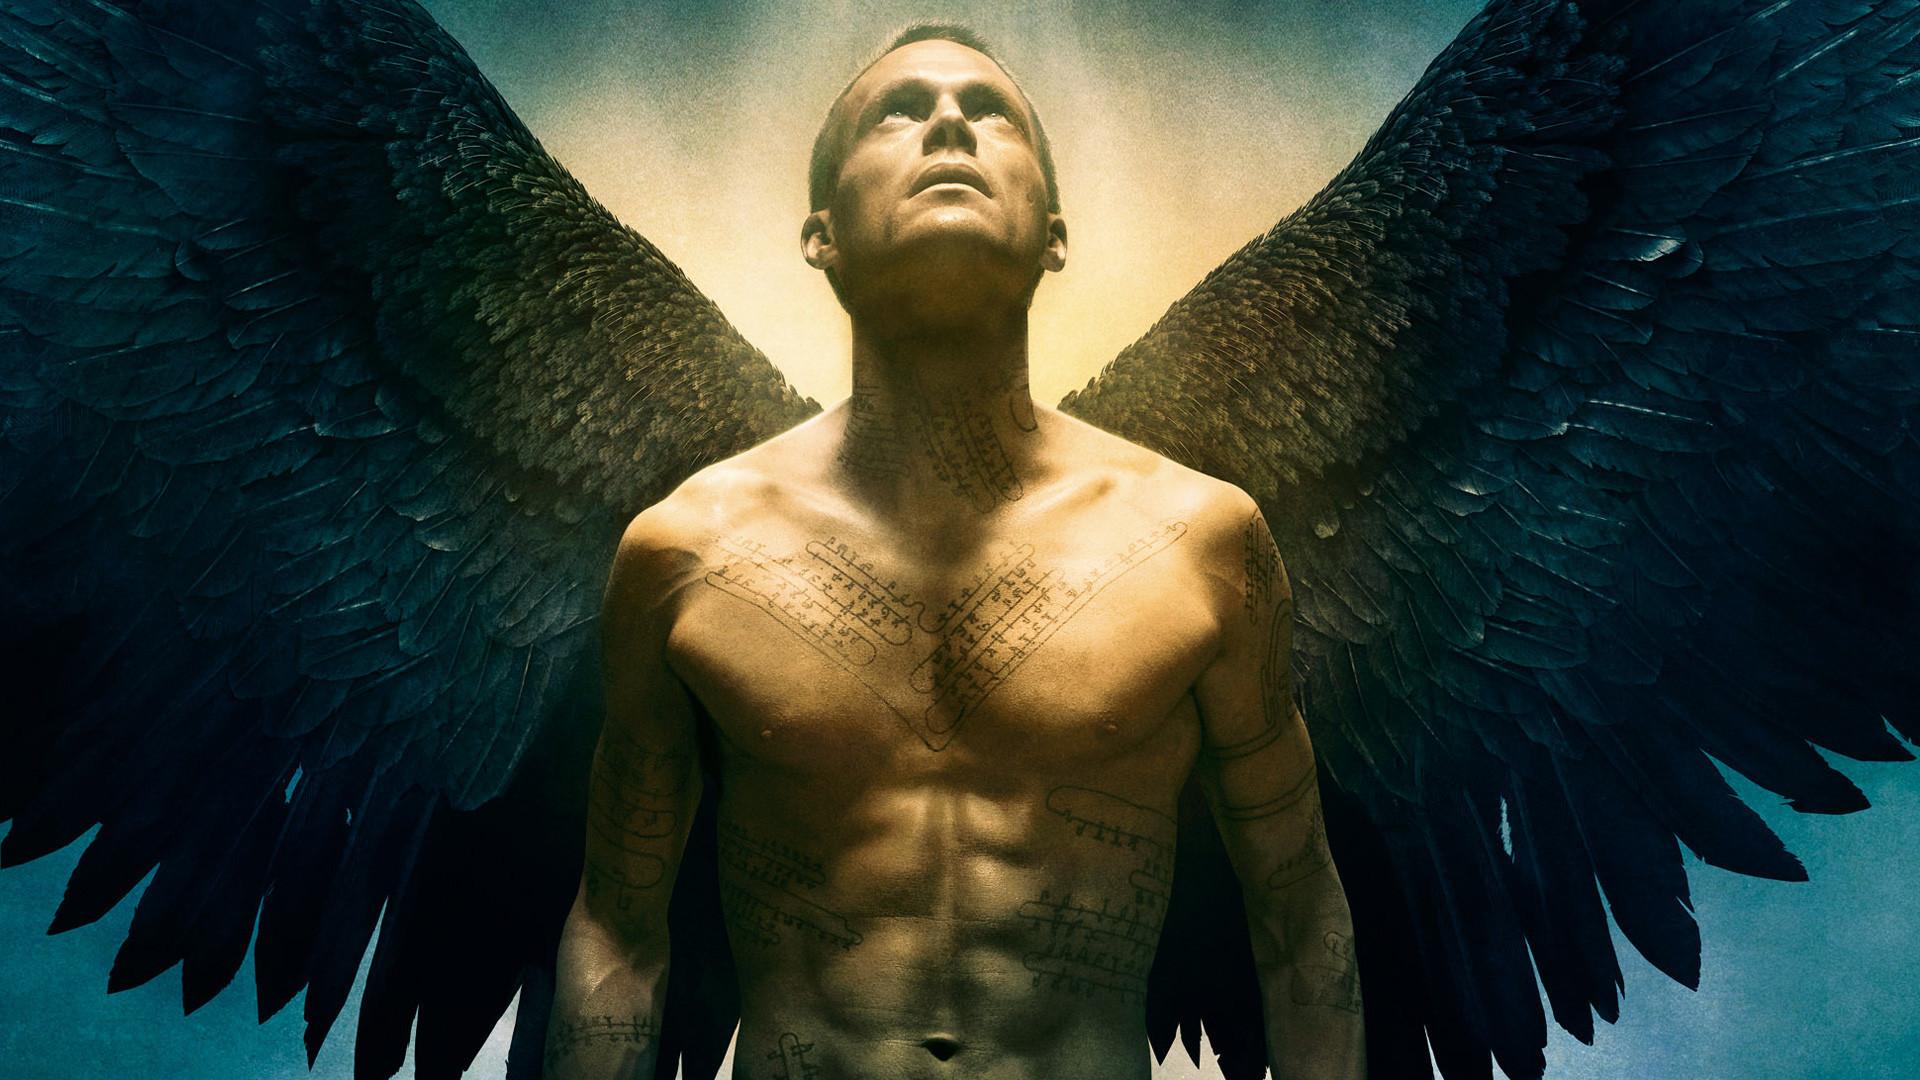 Wallpaper Legion, 2010 movie, Paul Bettany, angle, wings, tattoo